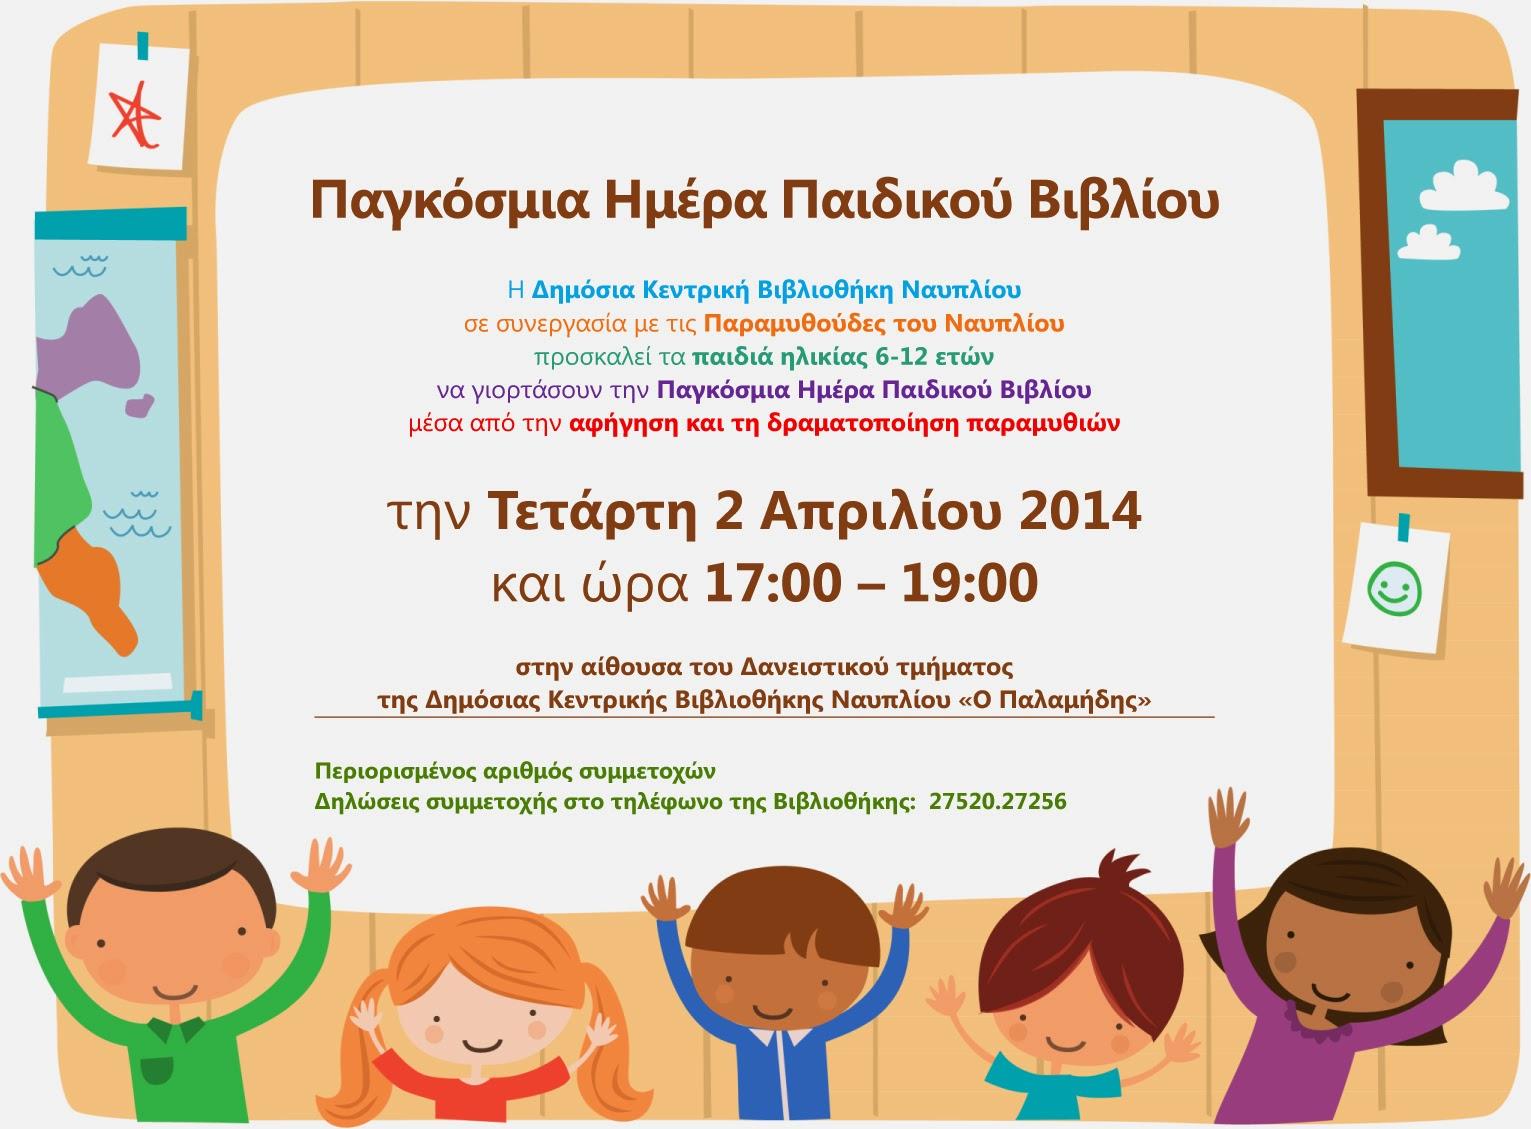 ec81e4406f8 ... Ναυπλίου σε συνεργασία με τις Παραμυθούδες του Ναυπλίου προσκαλεί τα  παιδιά ηλικίας 6-12 ετών να γιορτάσουν την Παγκόσμια Ημέρα Παιδικού Βιβλίου  μέσα ...